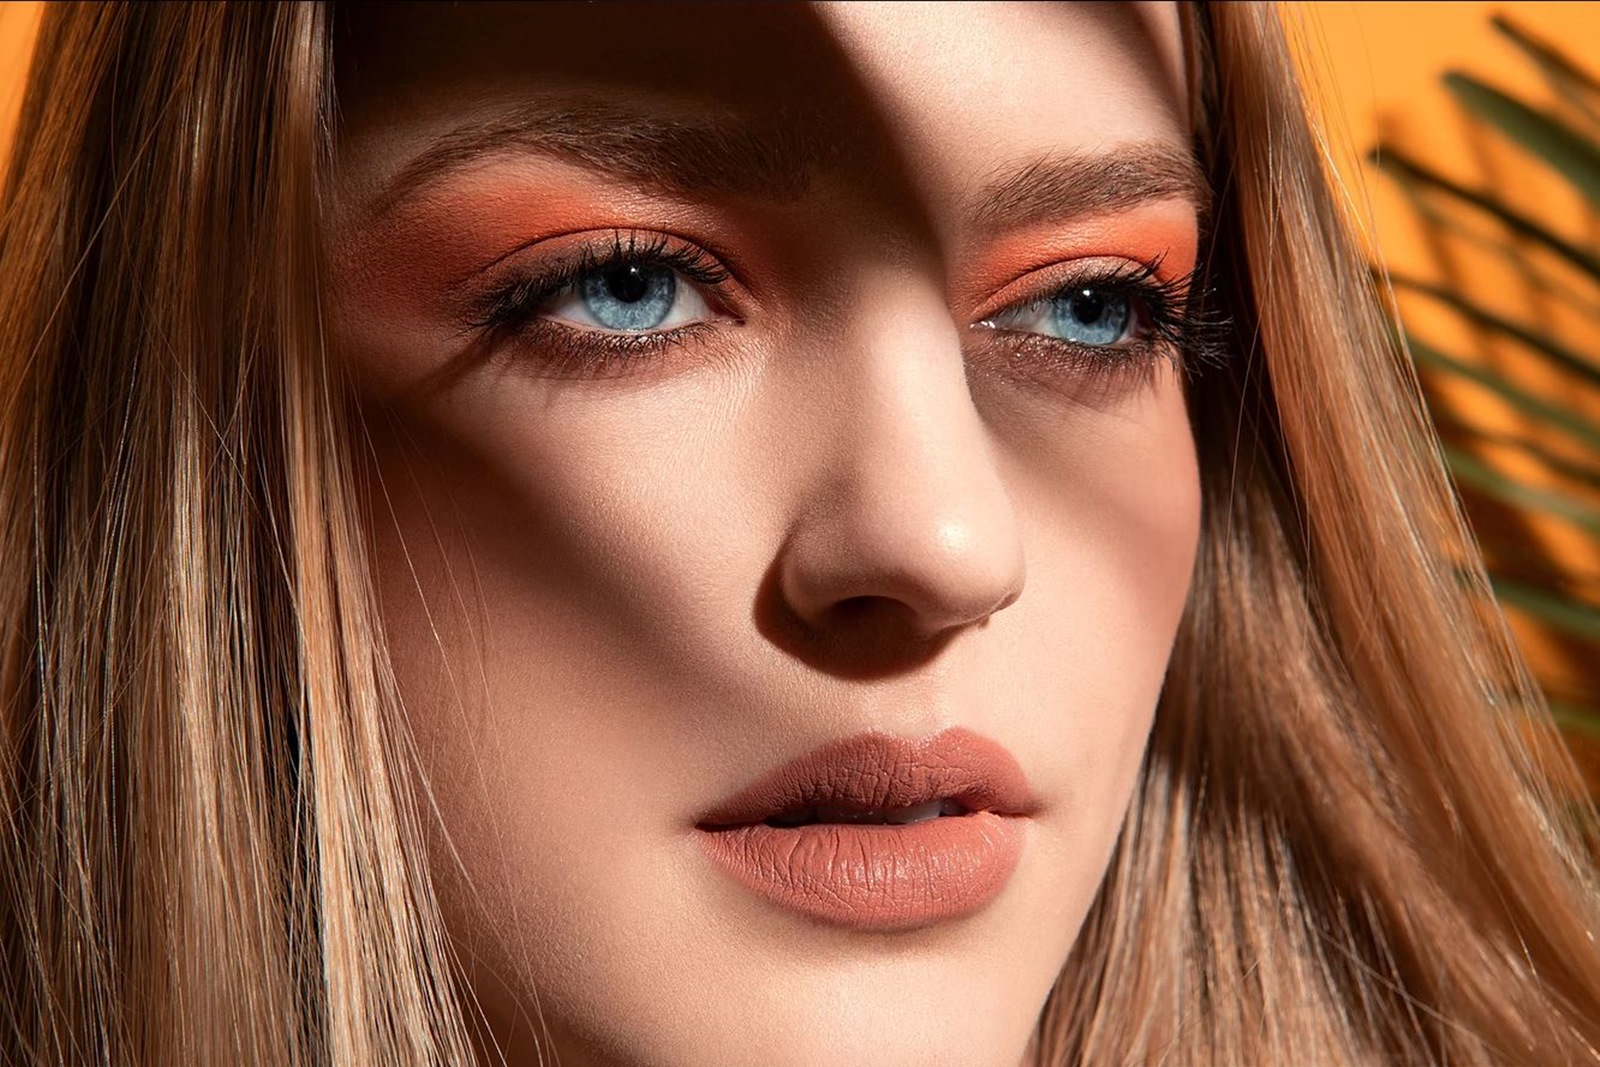 Make Up by Selina Beutler